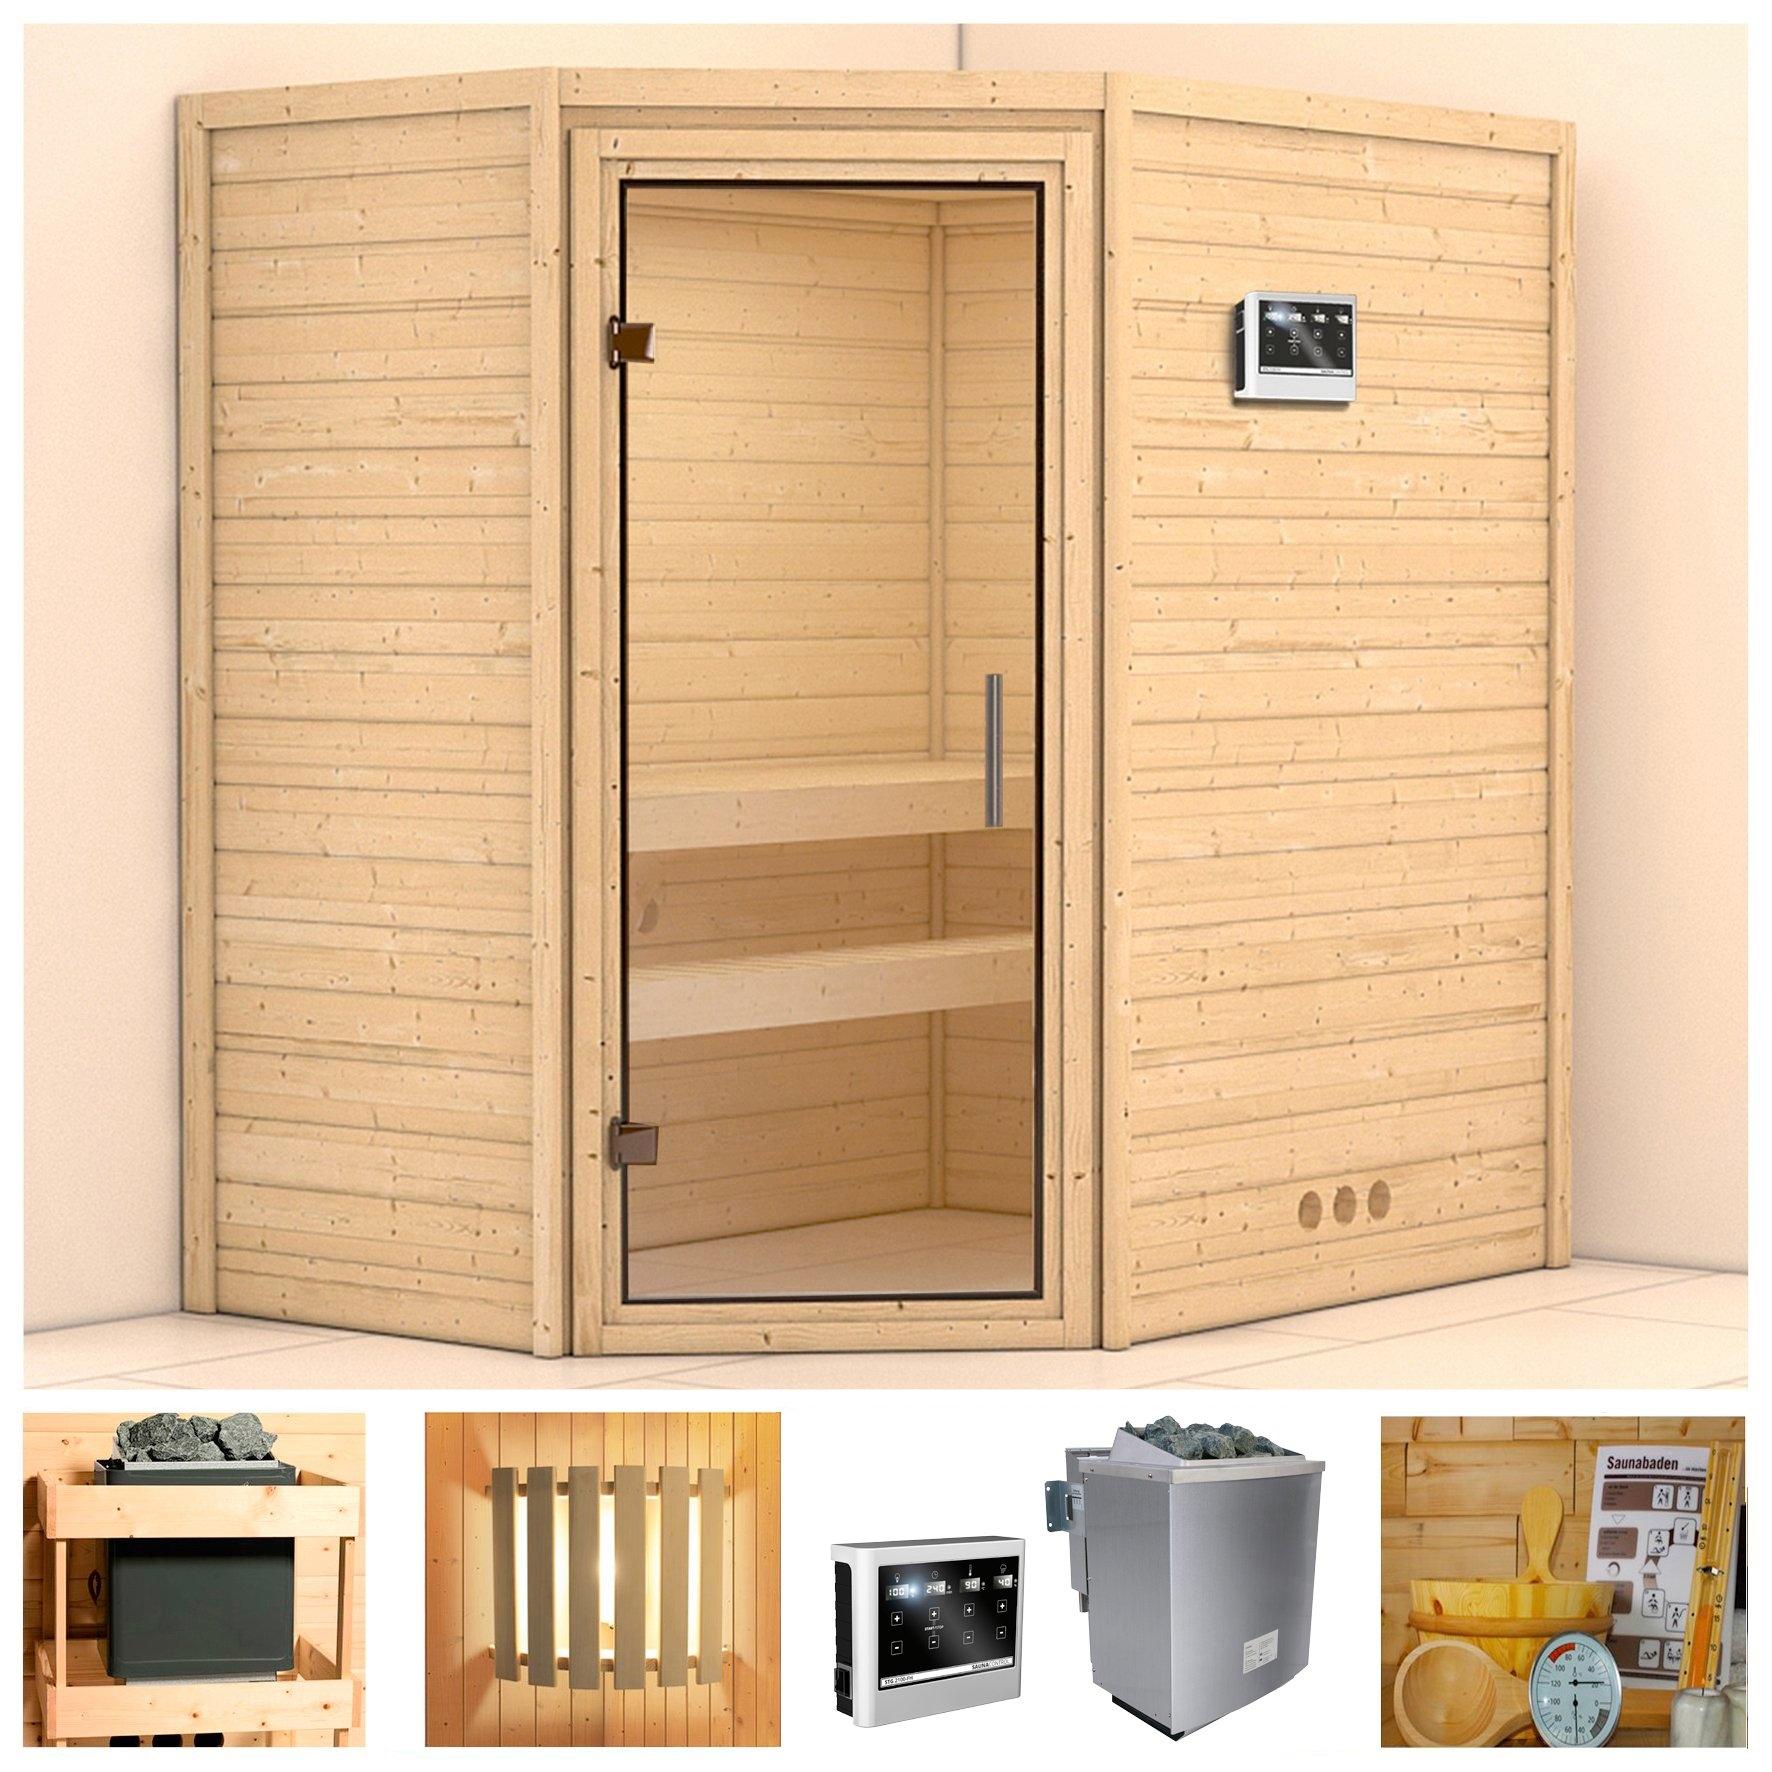 KONIFERA sauna »Svea«, 196/146/200 cm, 9-kW-Bio-Ofen mit ext. Strg., Glastür klar in de webshop van OTTO kopen